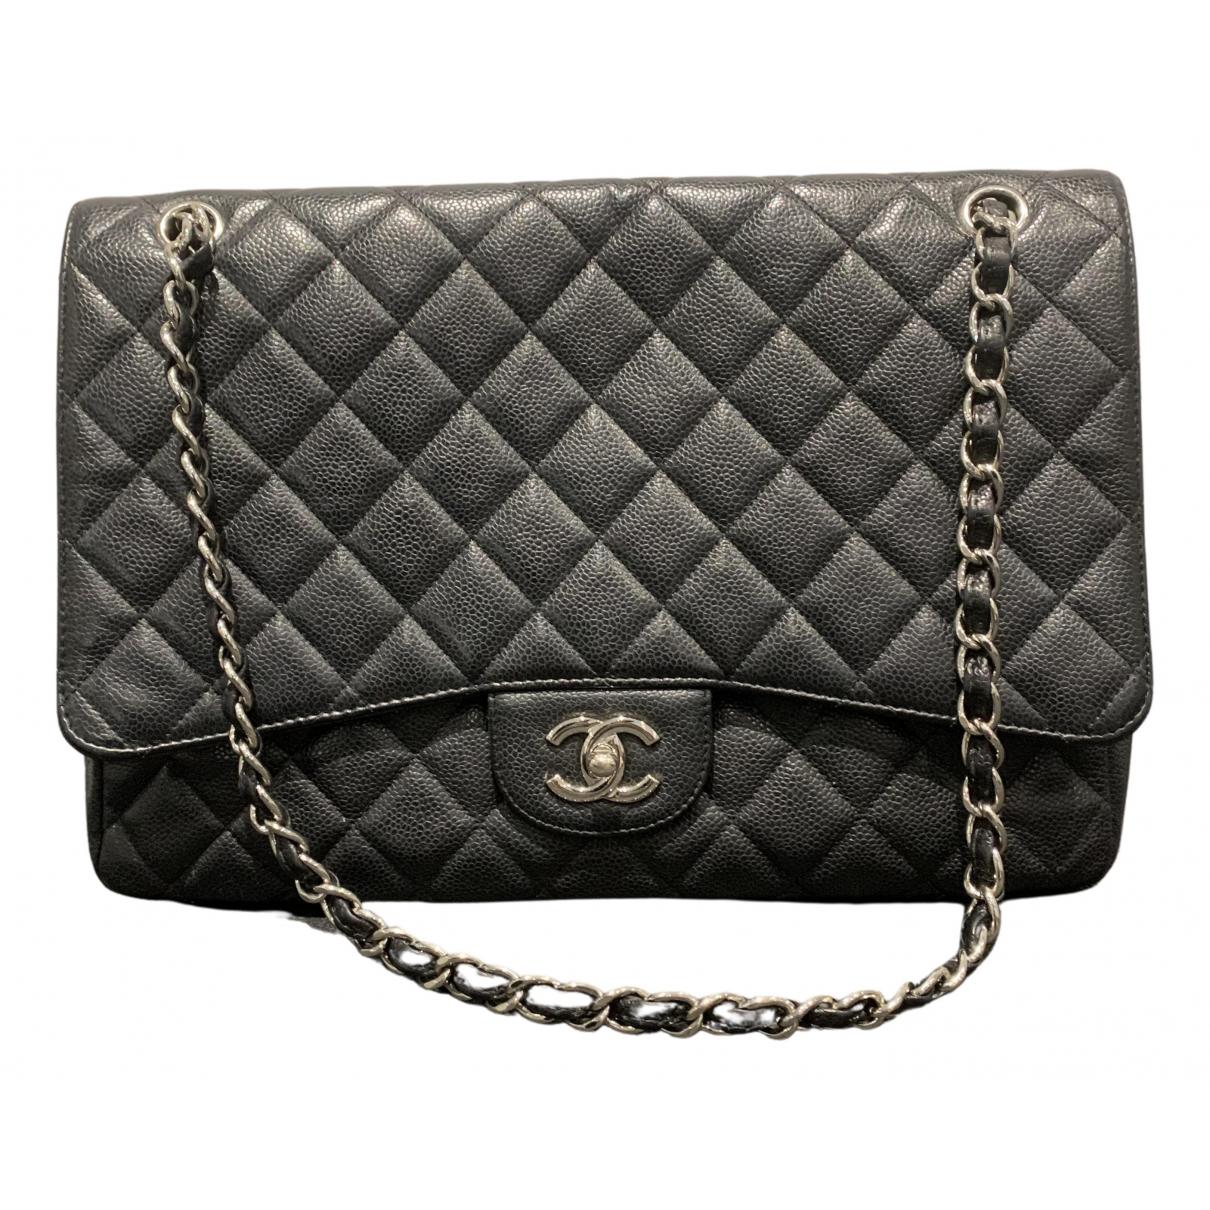 Chanel Timeless/Classique Handtasche in  Schwarz Leder